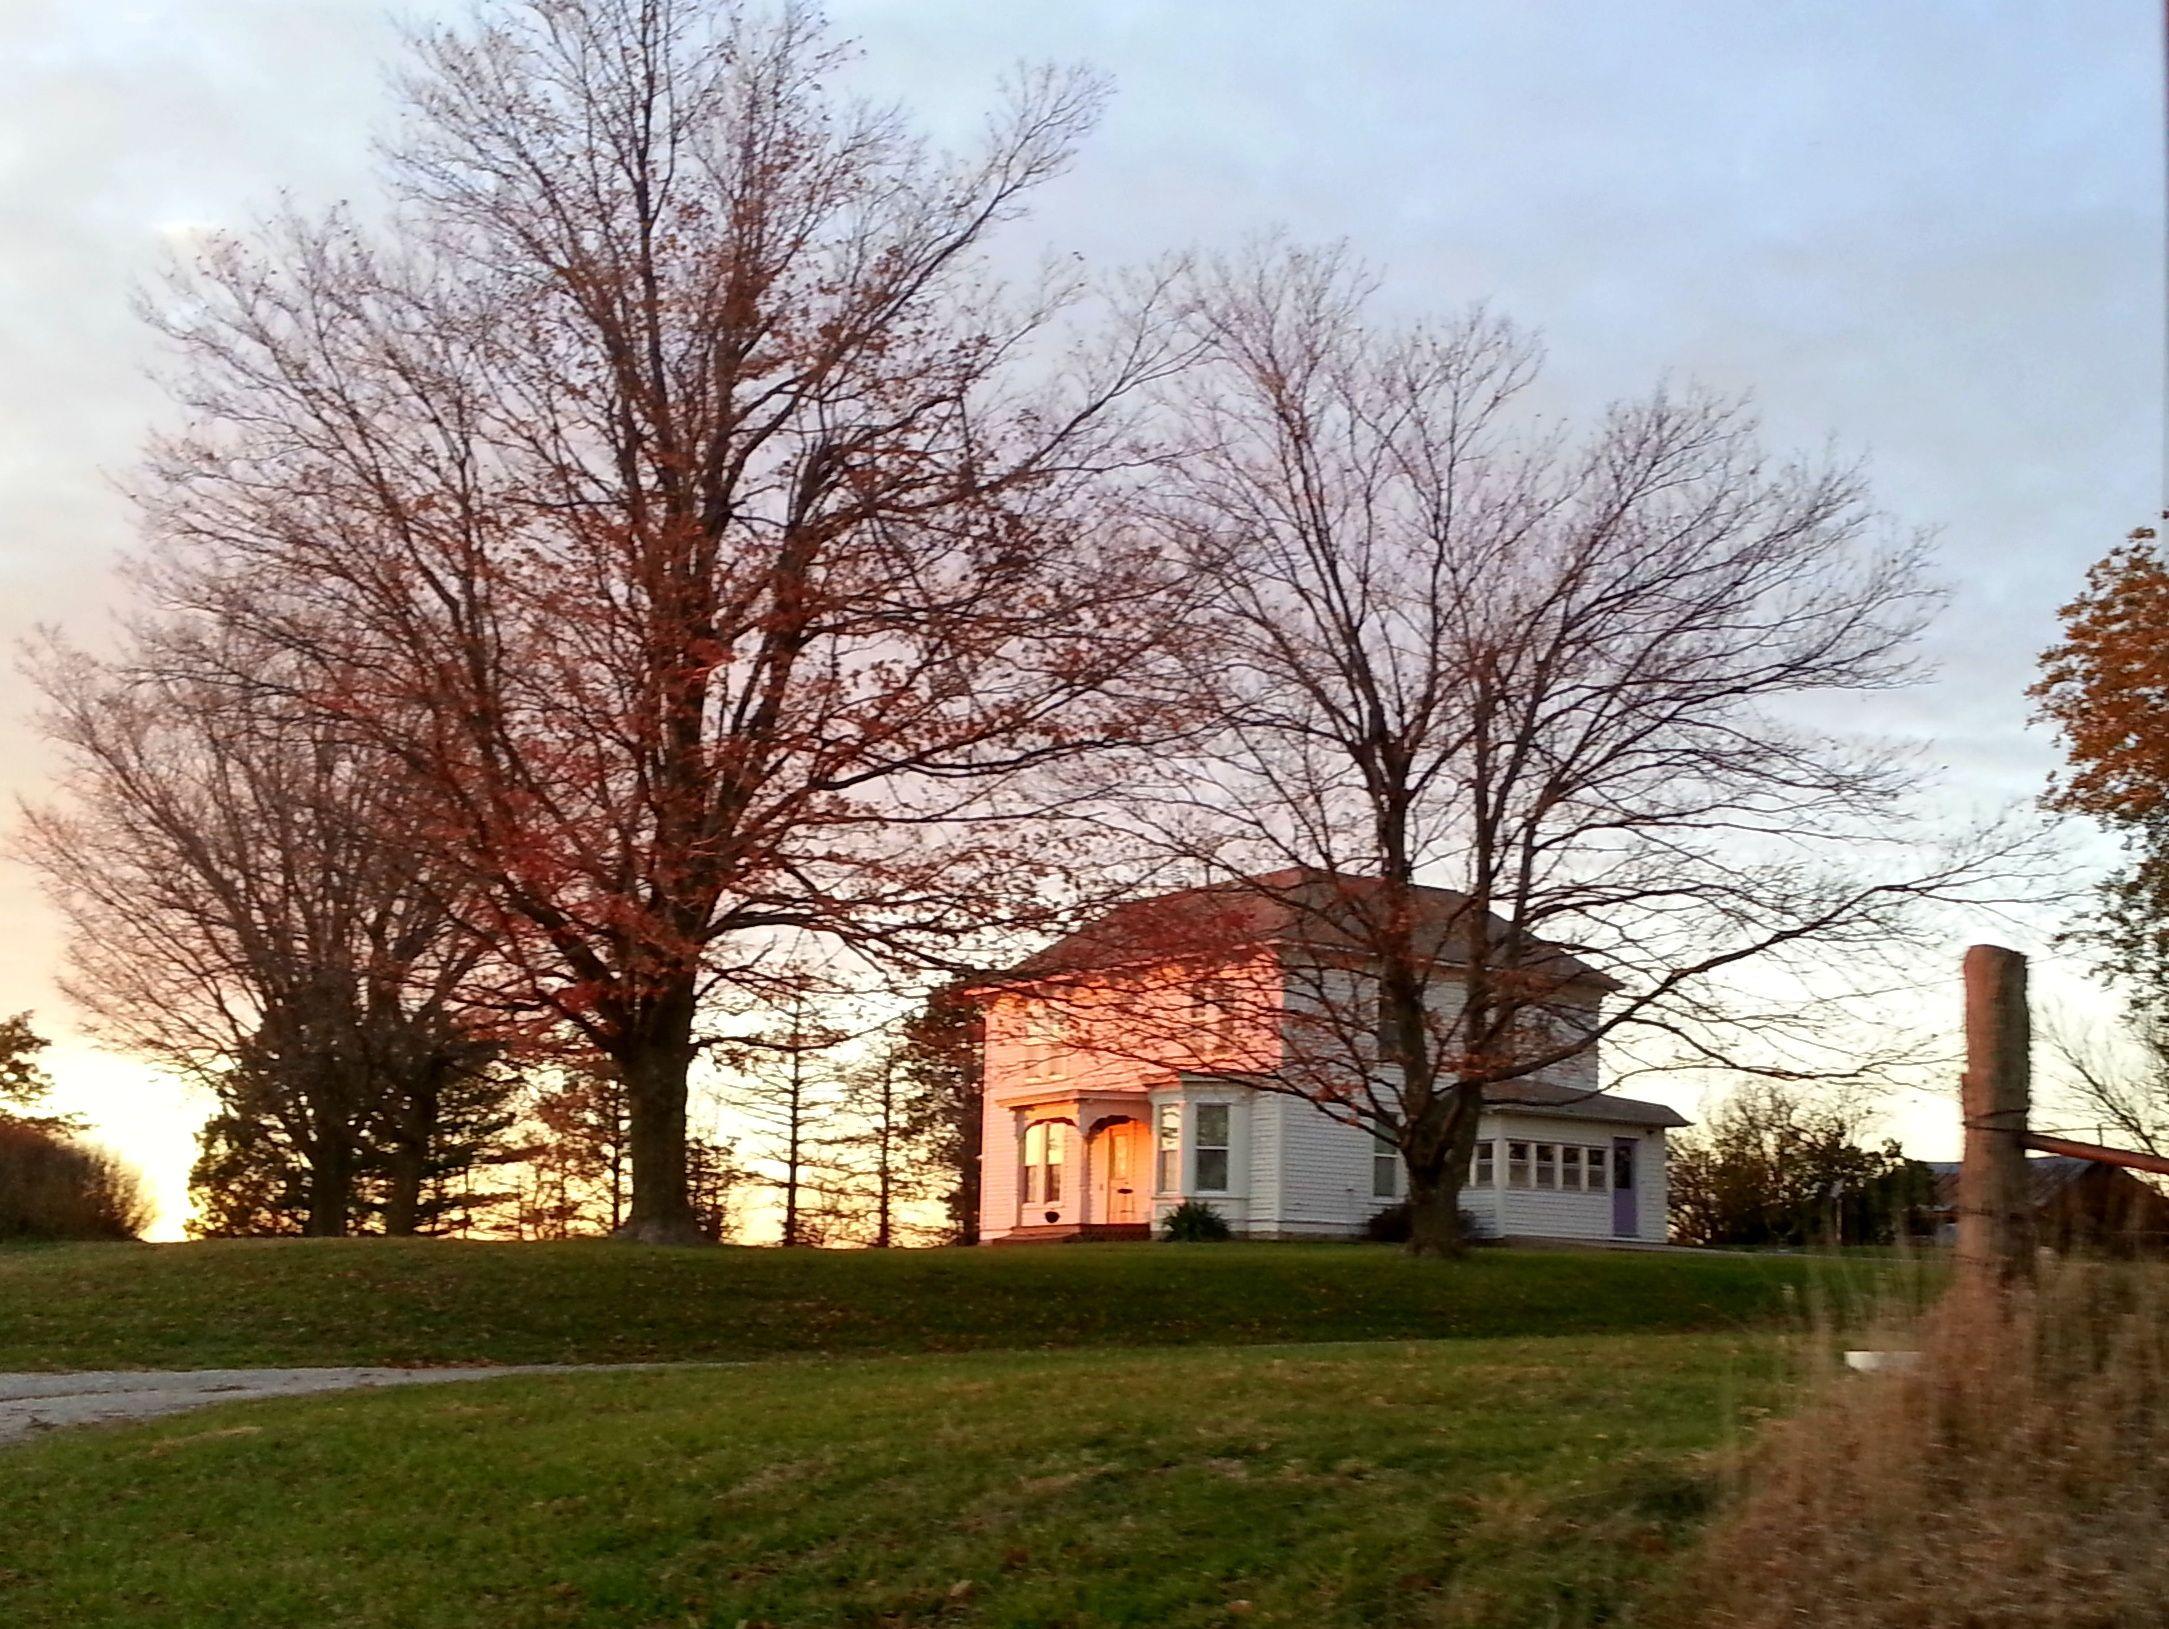 Kansas brown county everest - House Built By Rasmus And Anna Jensen C1885 In Everest Kansas Still Held By